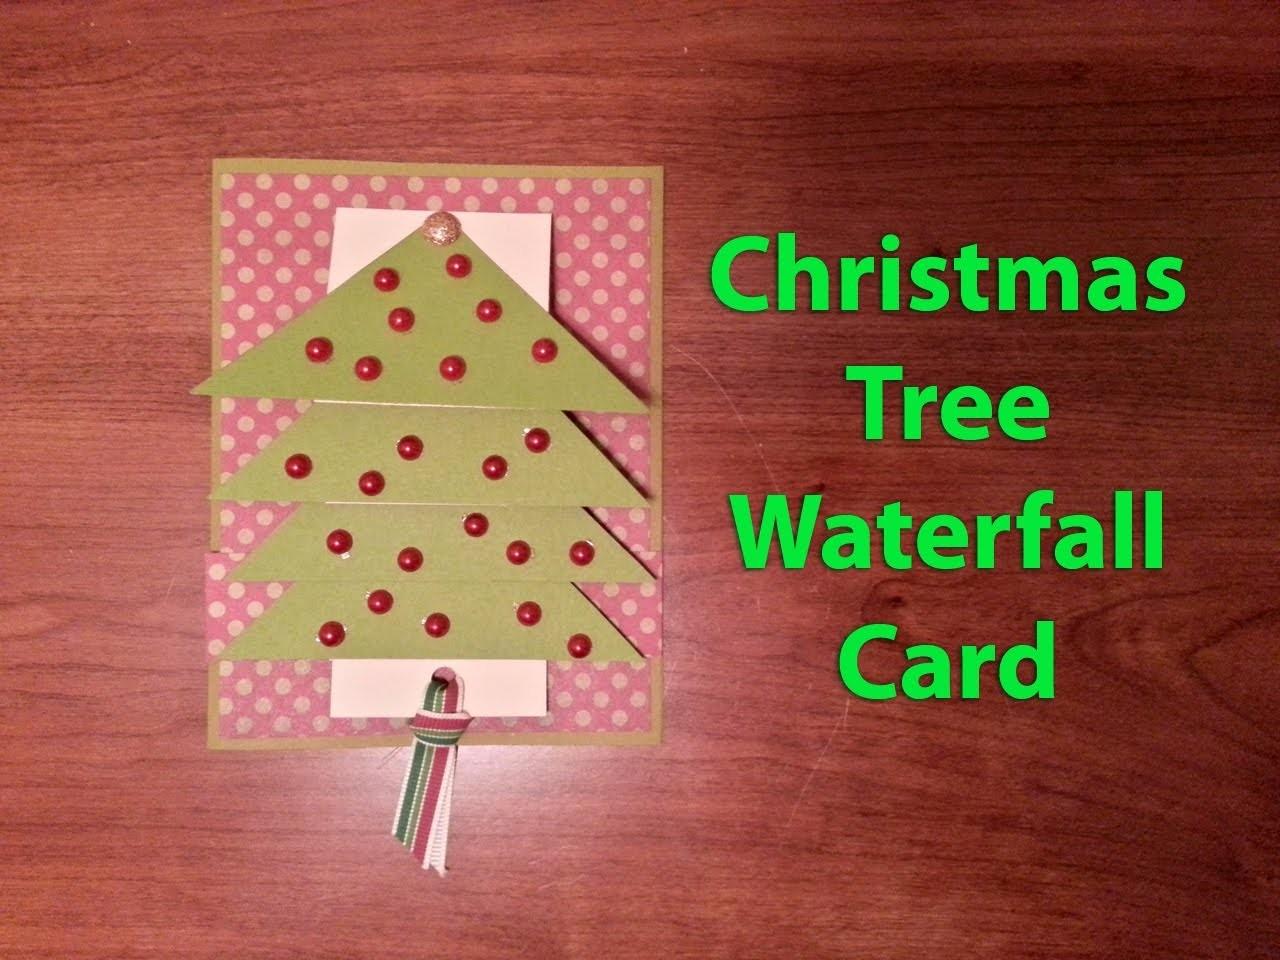 Christmas Tree Waterfall Card Tutorial